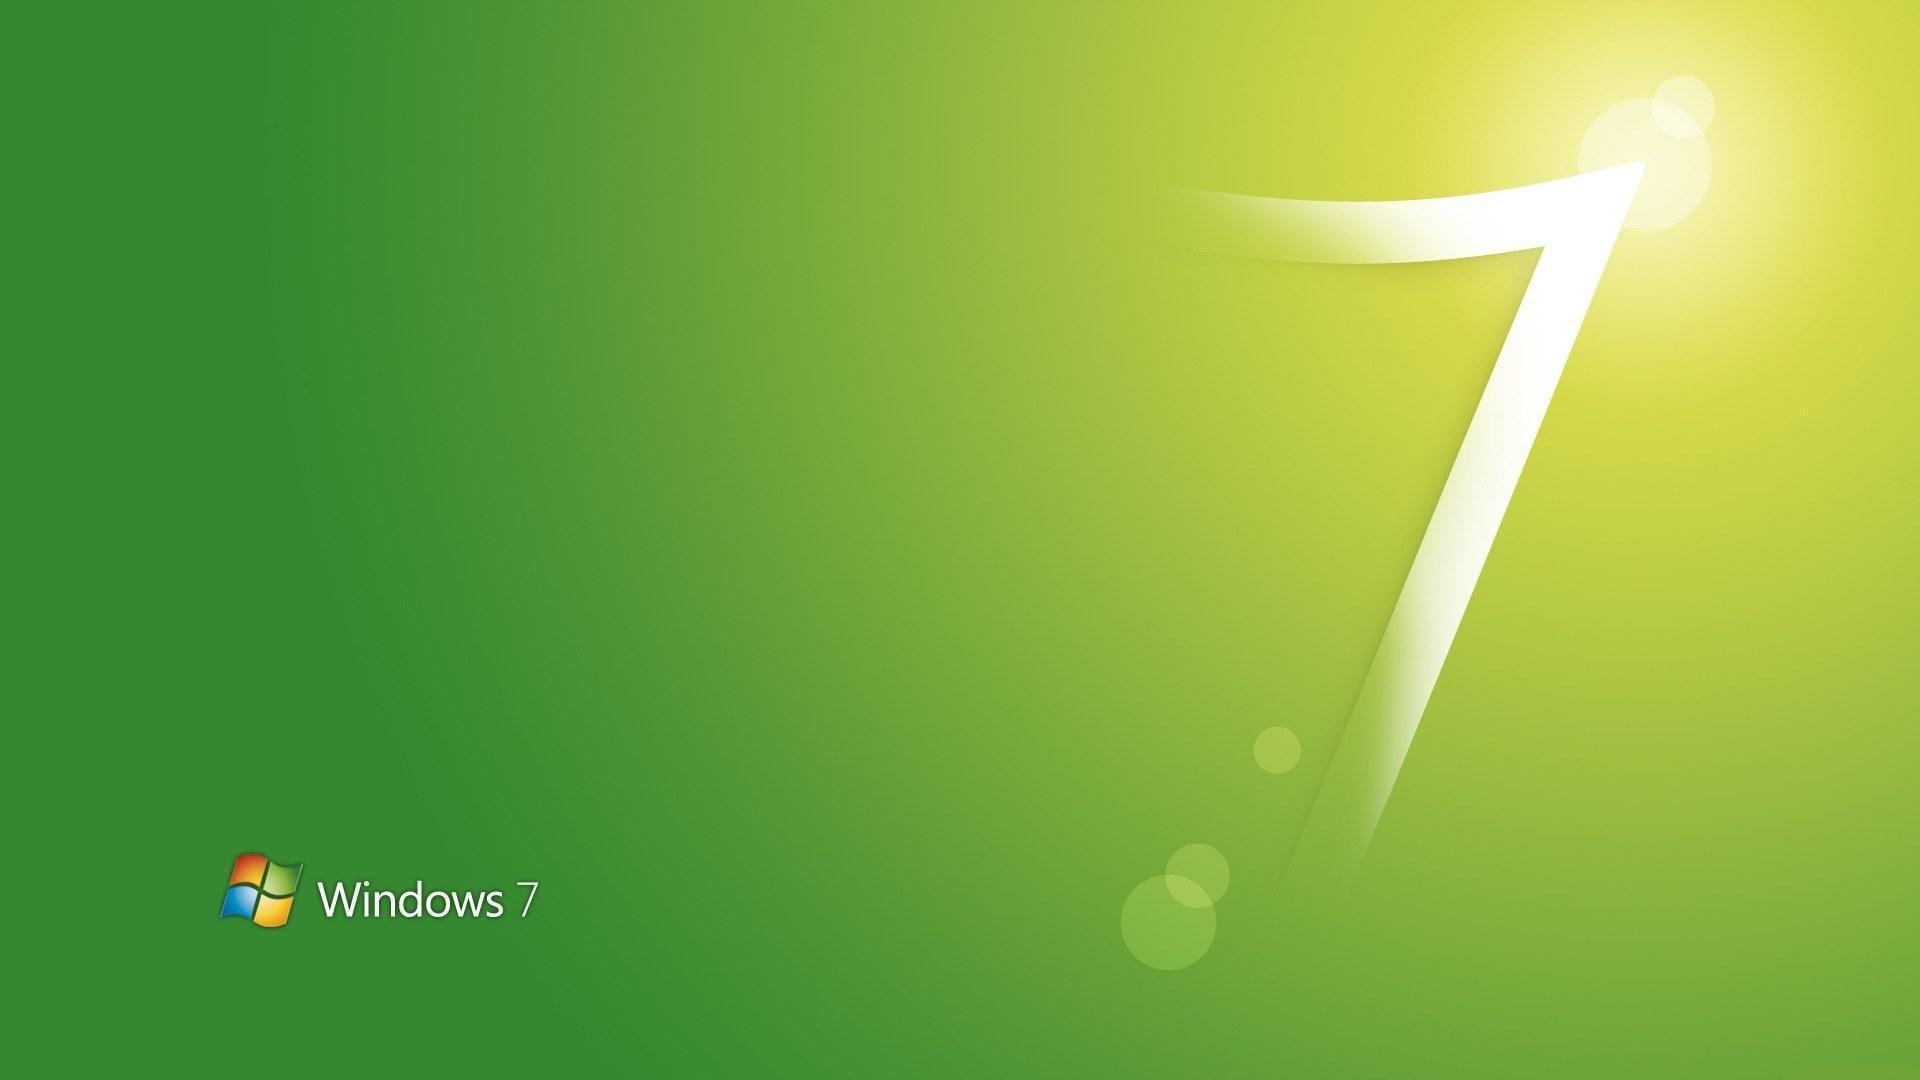 Download Wallpapers Windows 7 4k Se7en Blue Background: Windows 7 Home Premium Wallpapers